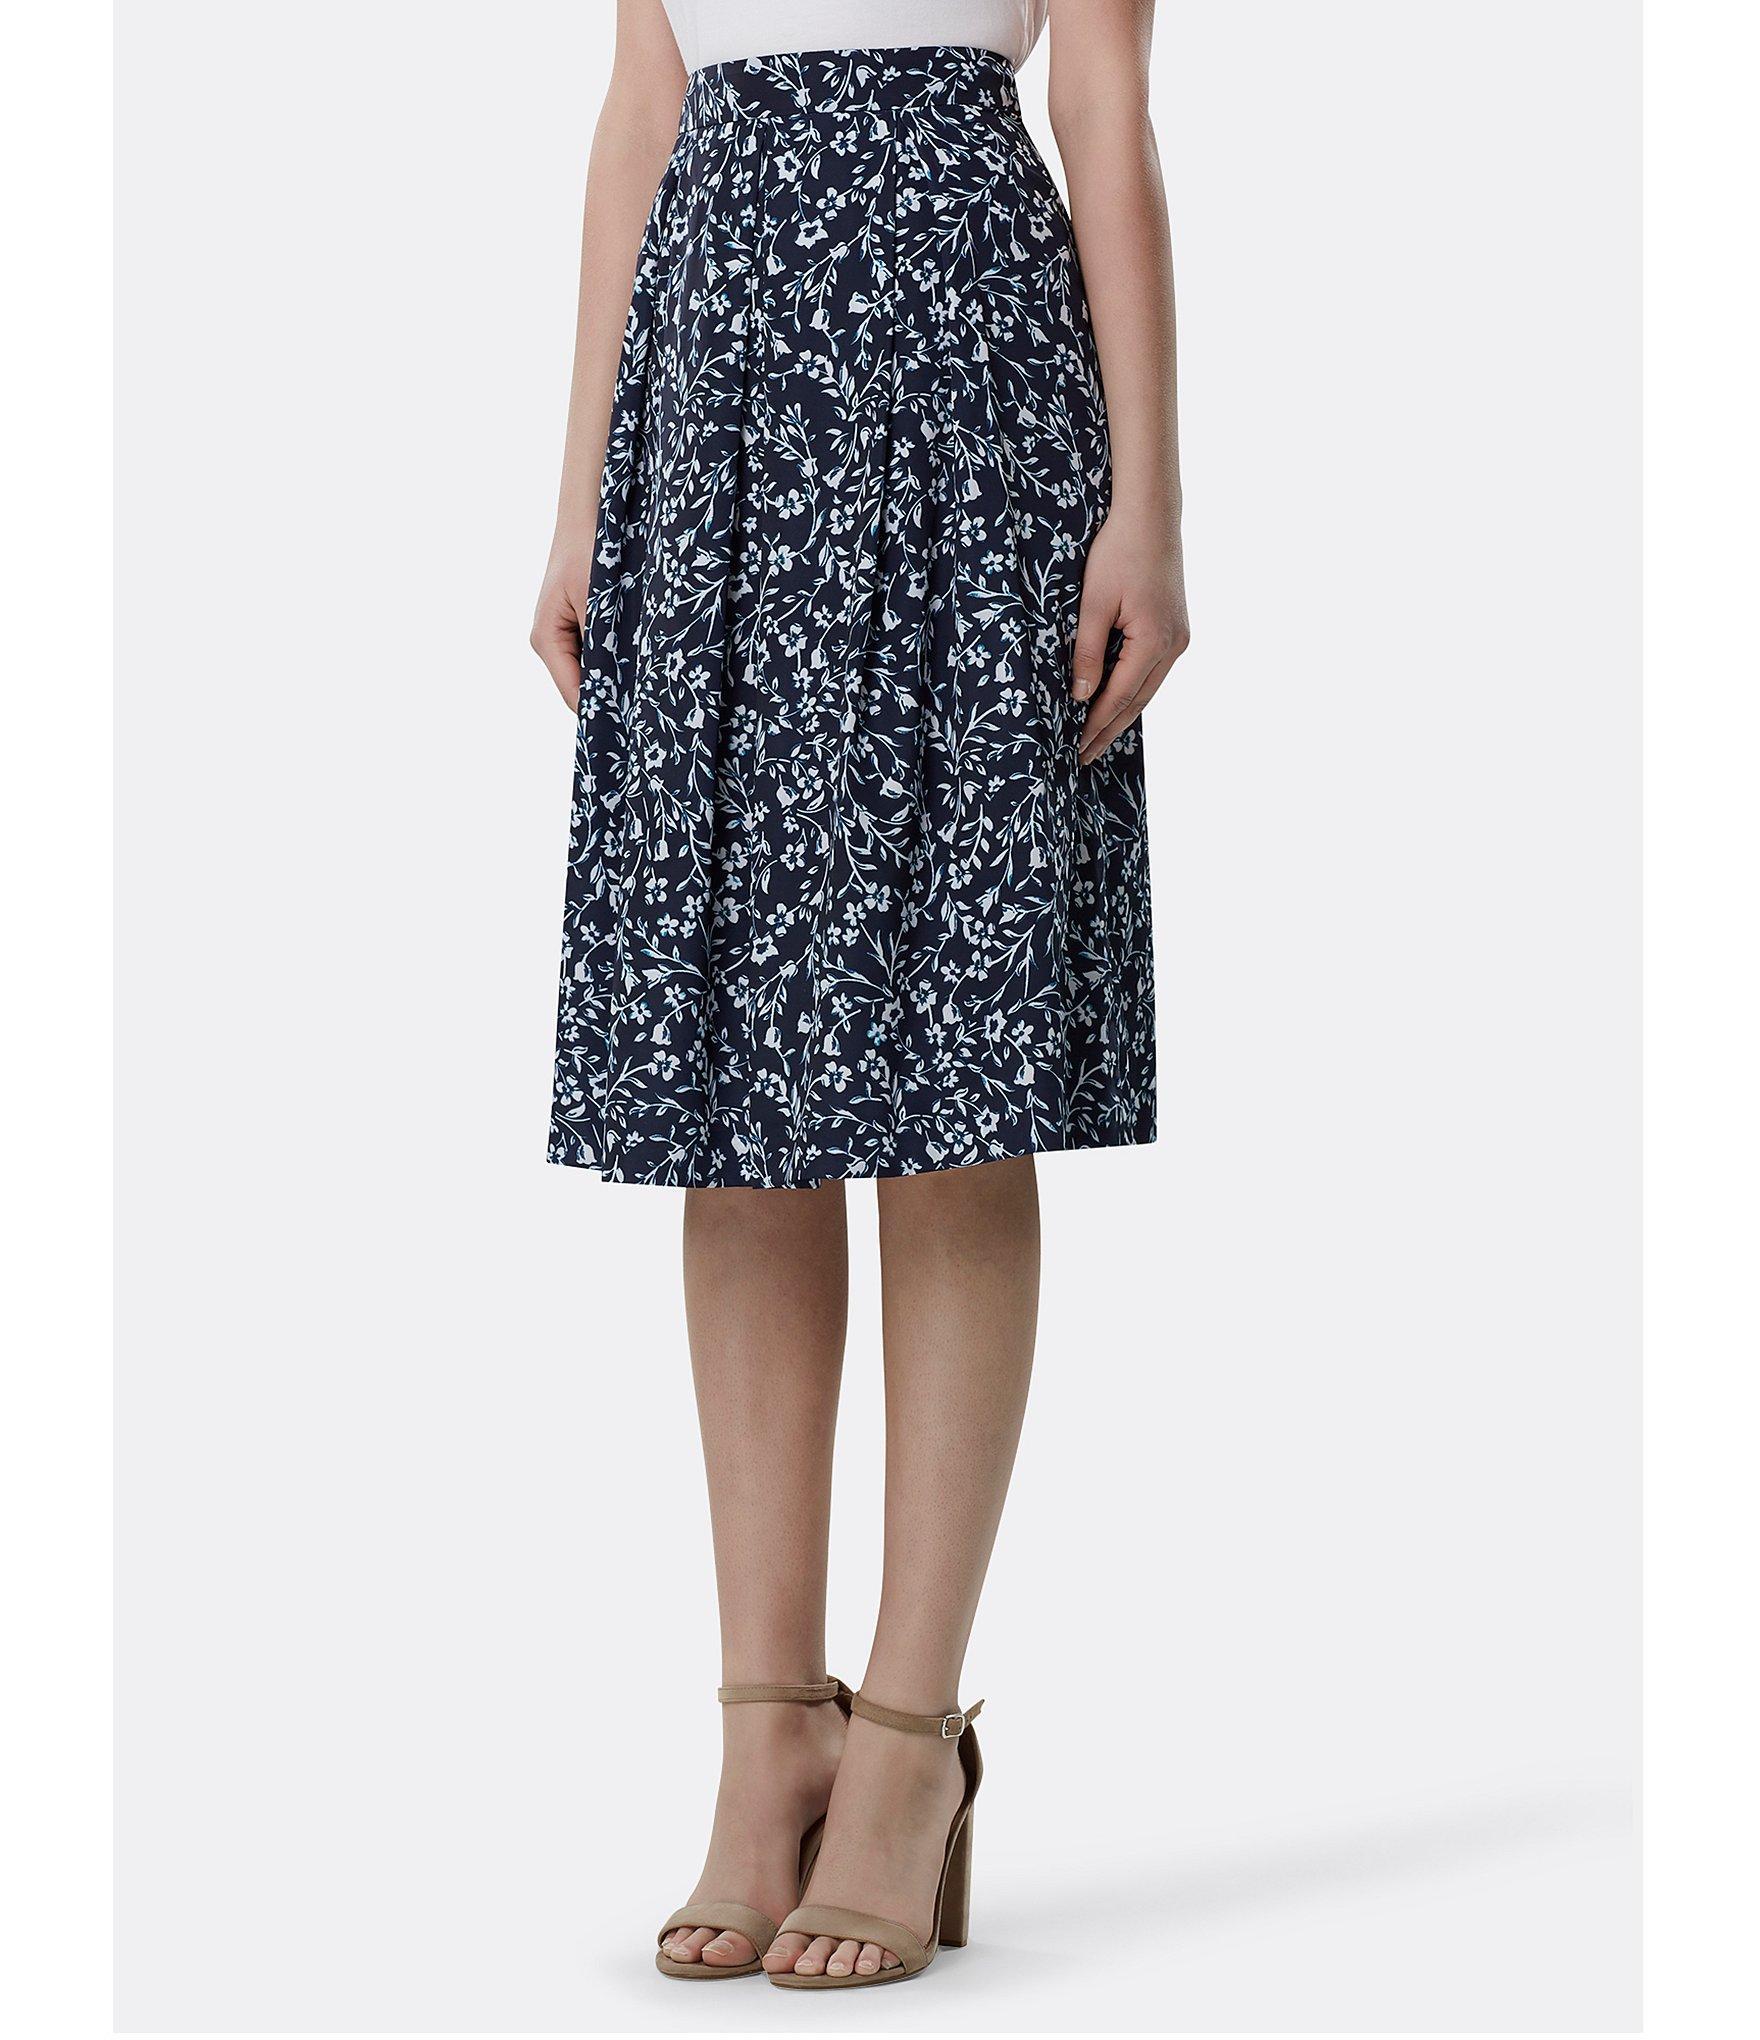 53103c33761 Dillards Petite Long Skirts